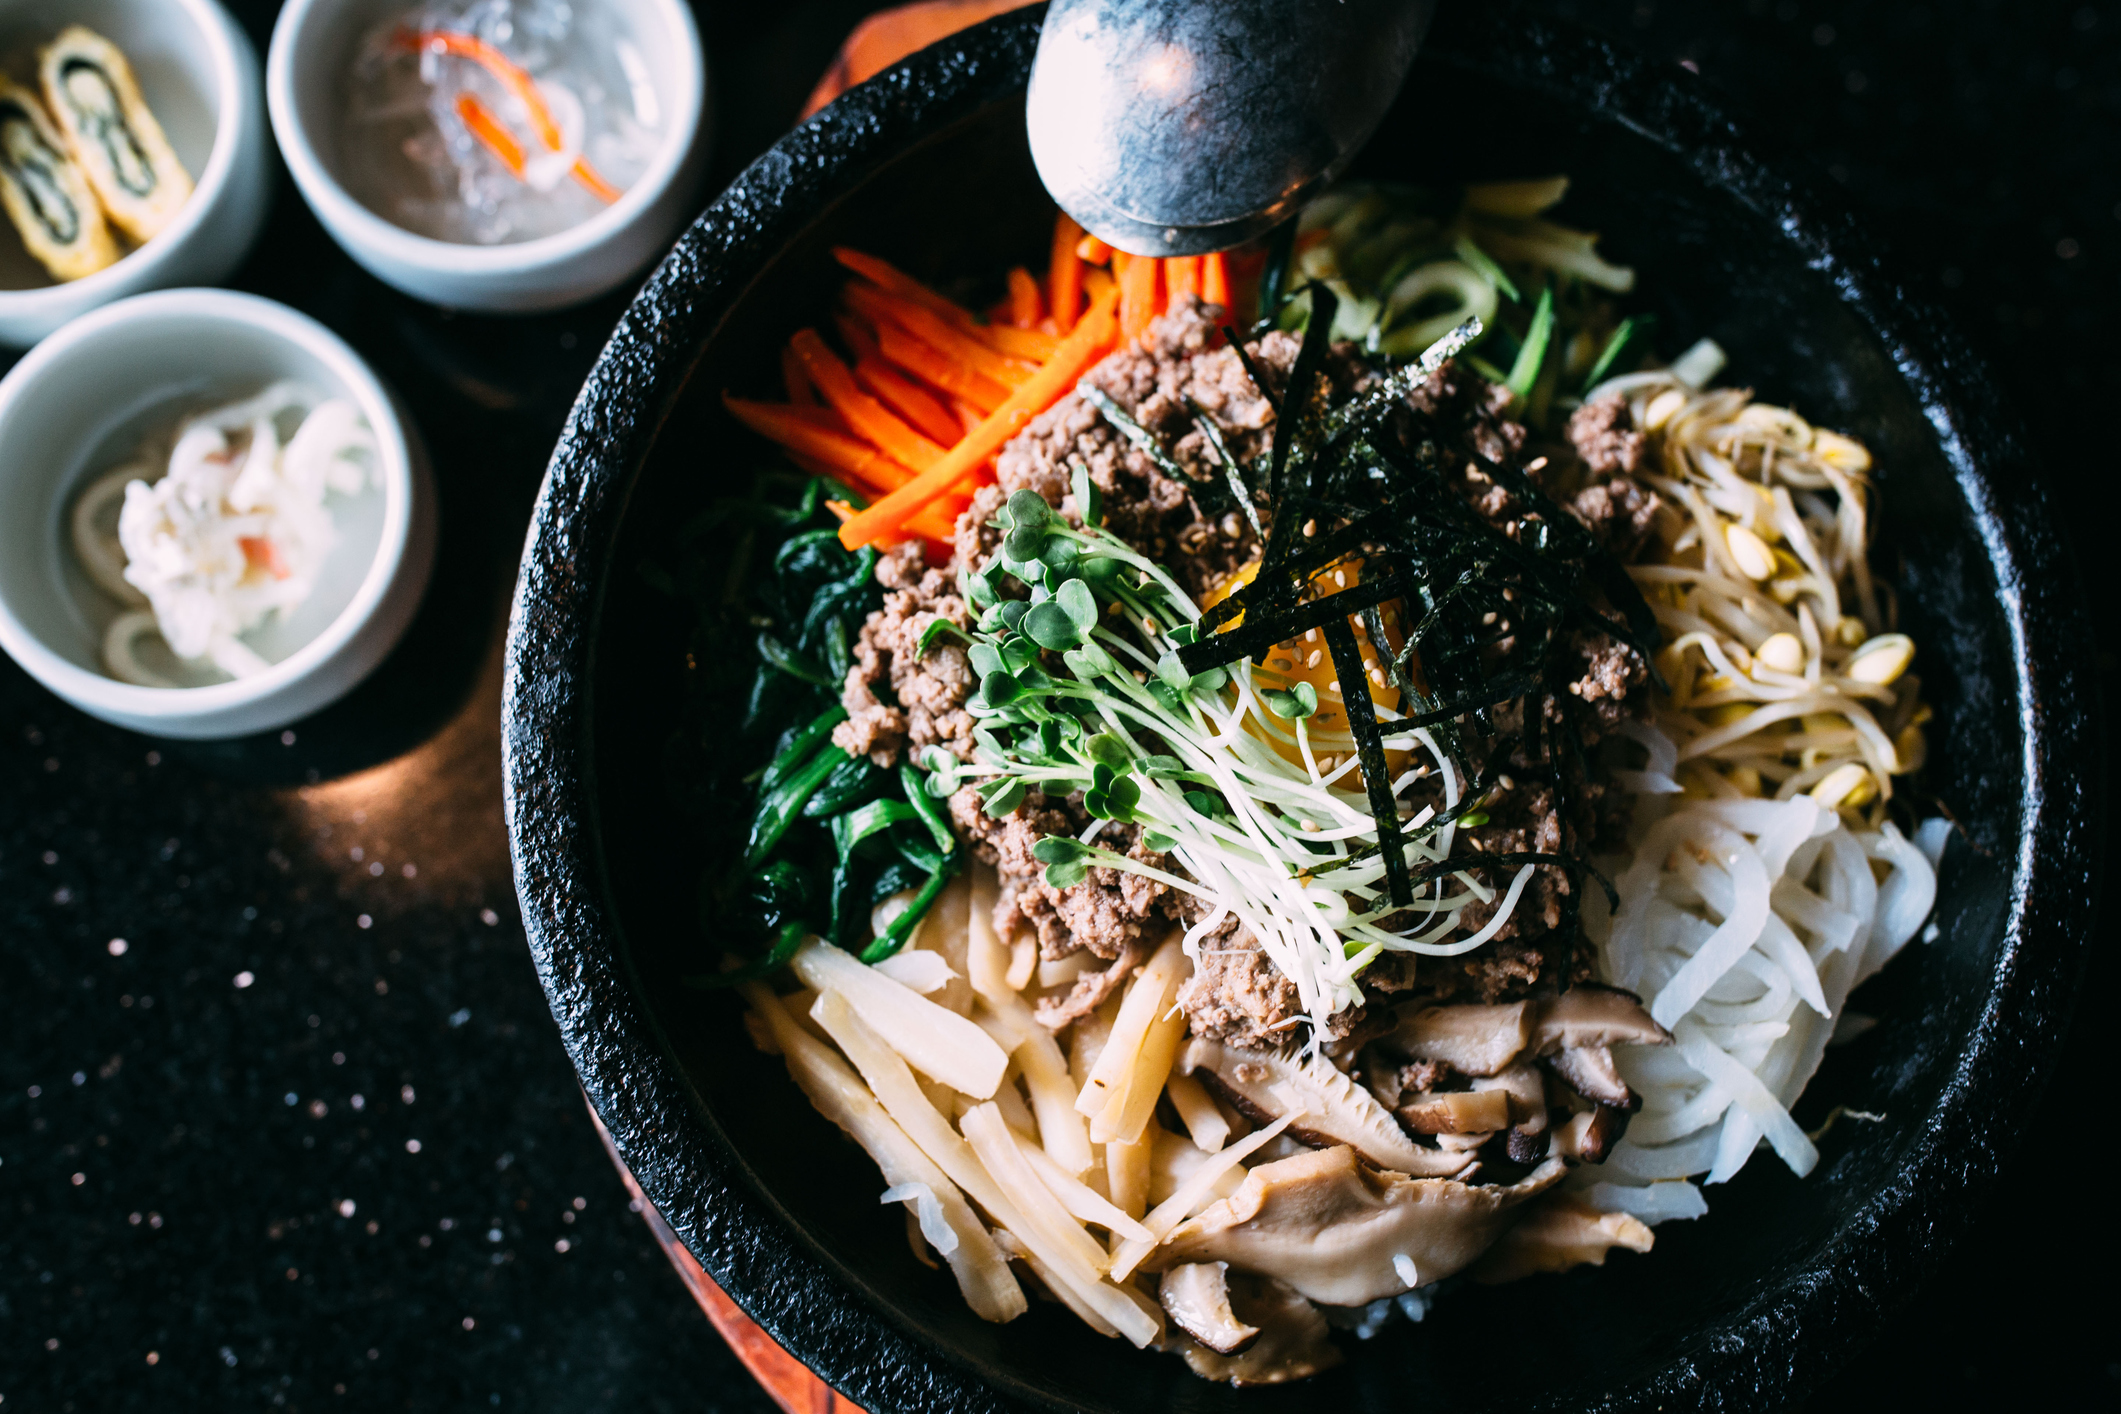 KOREAN BBQ - Build Your Own Bibimbap BowlsBulgogi | Bamboo Sprouts |Kimchi |Sesame CarrotsSoy Glazed Shitakes |Scallion Slaw,Gochujang Date Sauce |Rice |Lettuce Cups